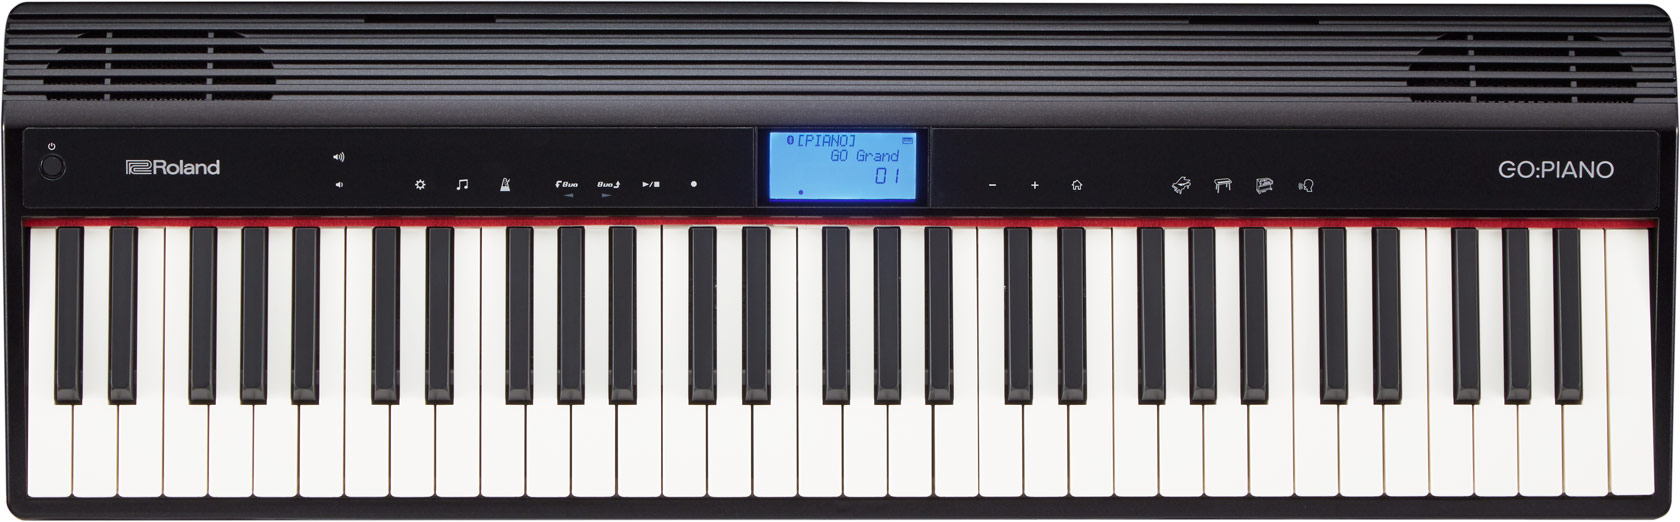 Teclado Roland para iniciantes Go: Piano. Possui 61 teclas